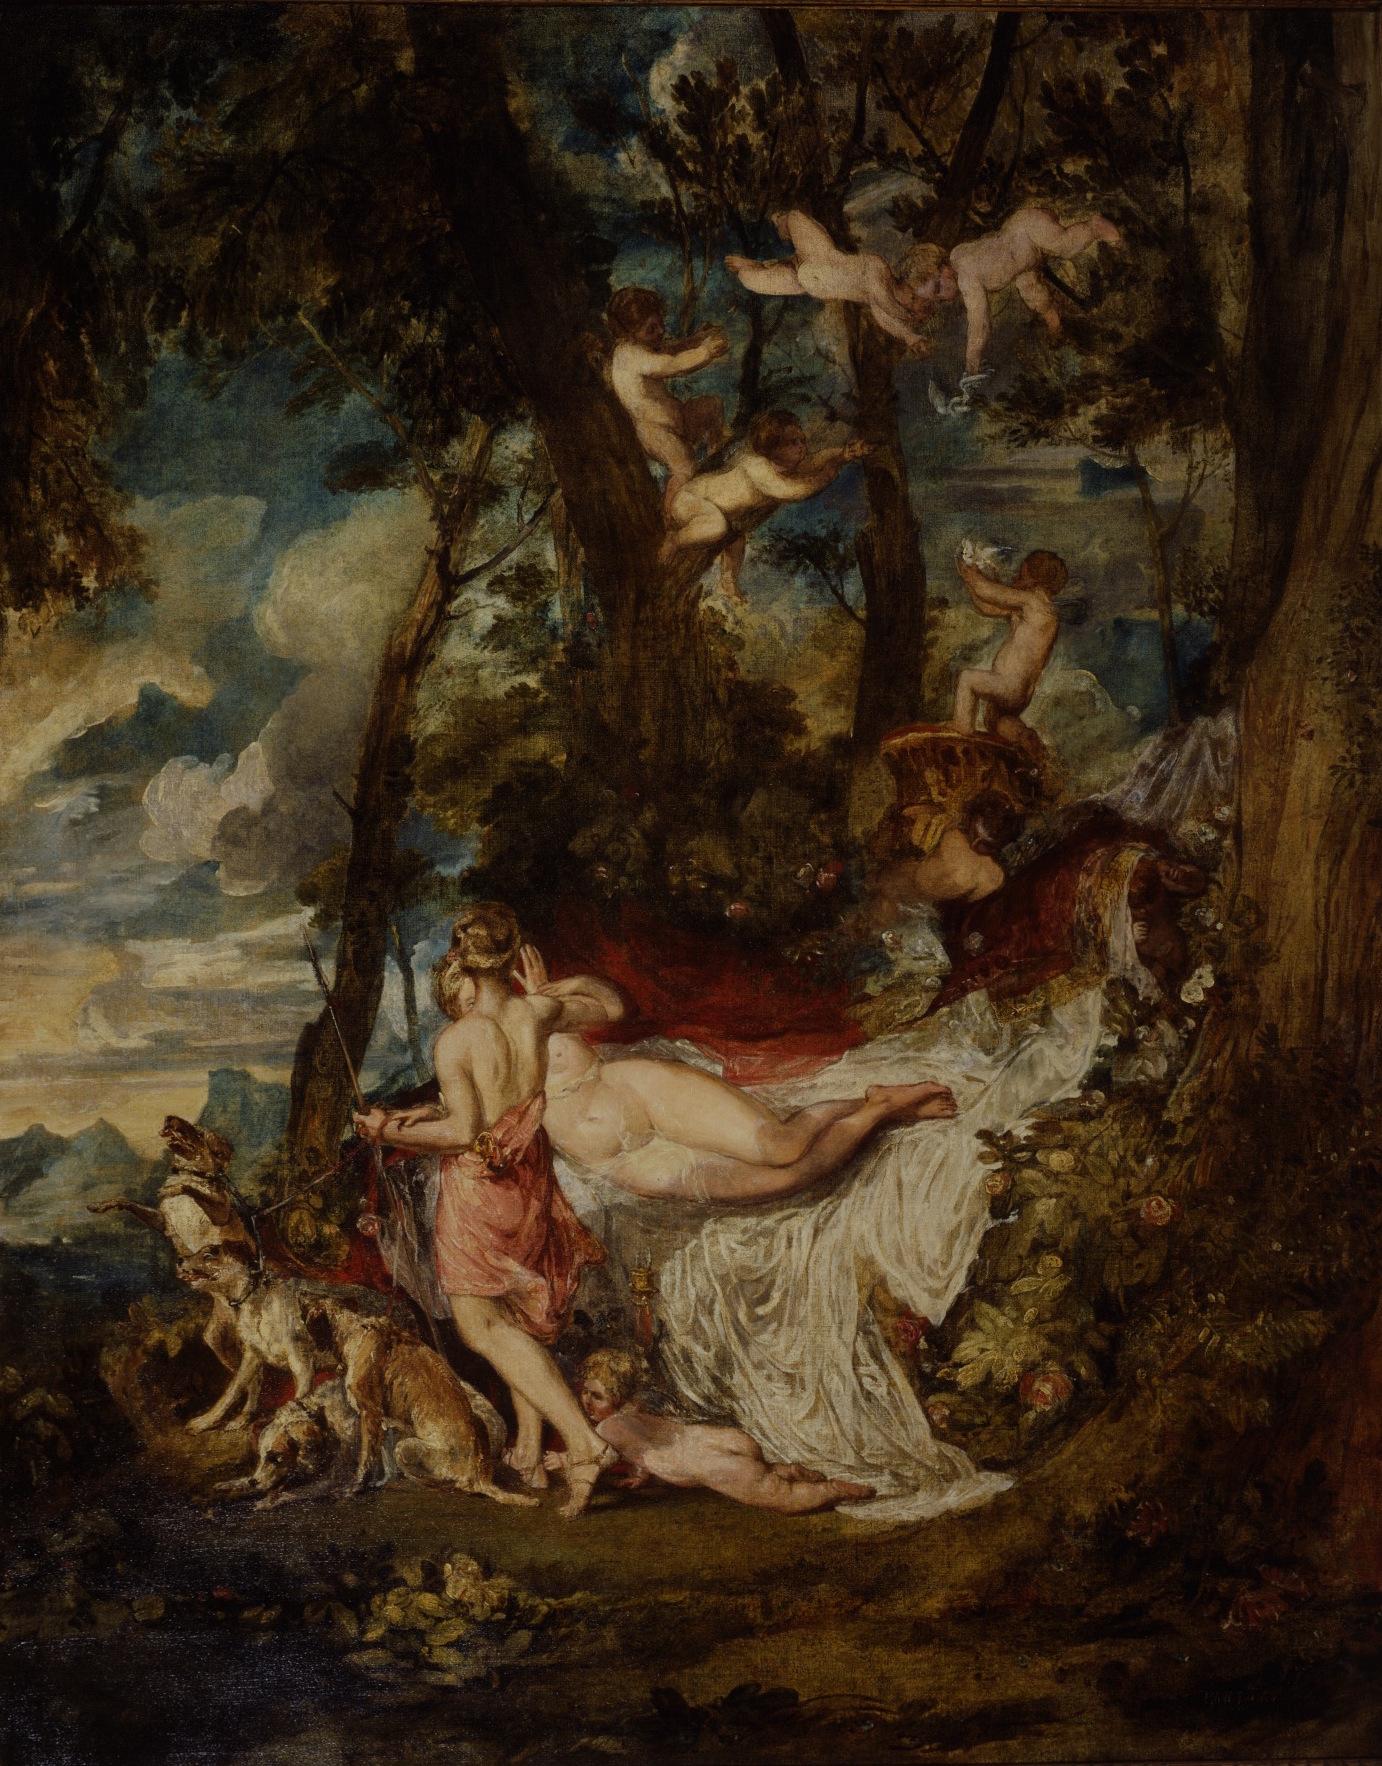 Joseph Mallord William Turner – Venus and Adonis